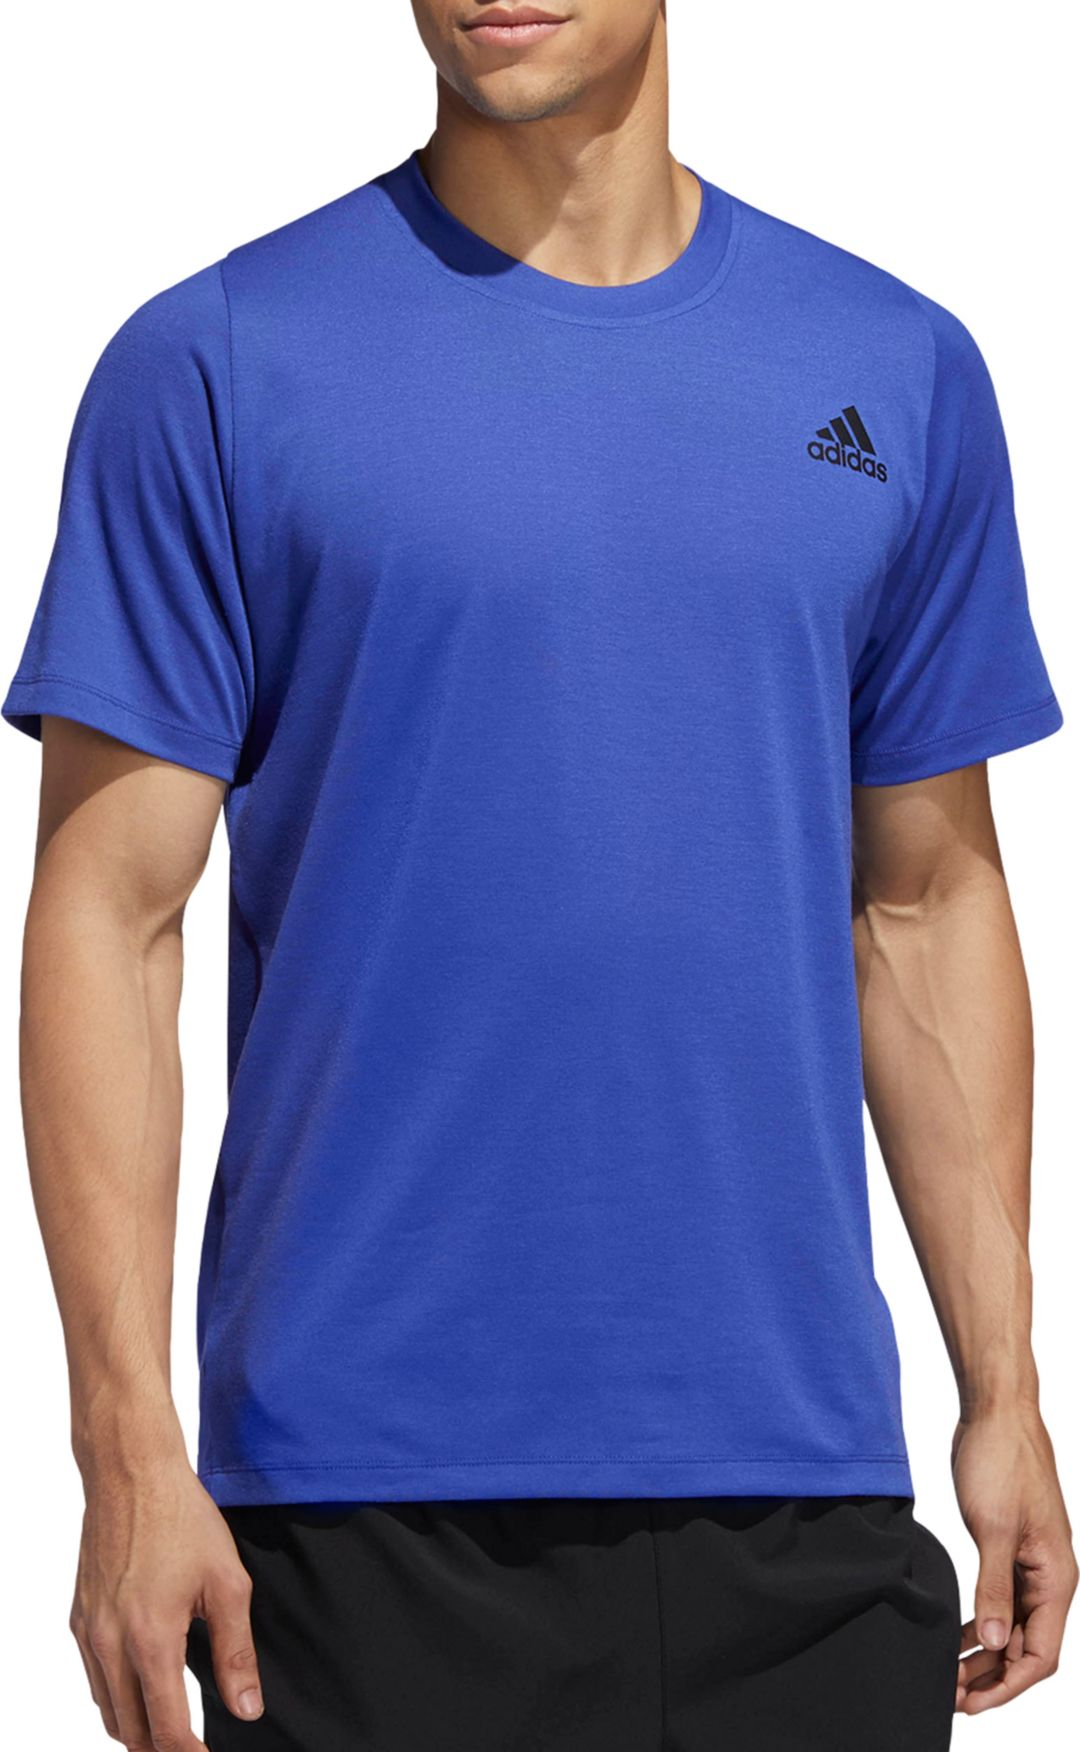 9ed590b02 adidas Men's FreeLift Sport Prime Lite T-Shirt | DICK'S Sporting Goods